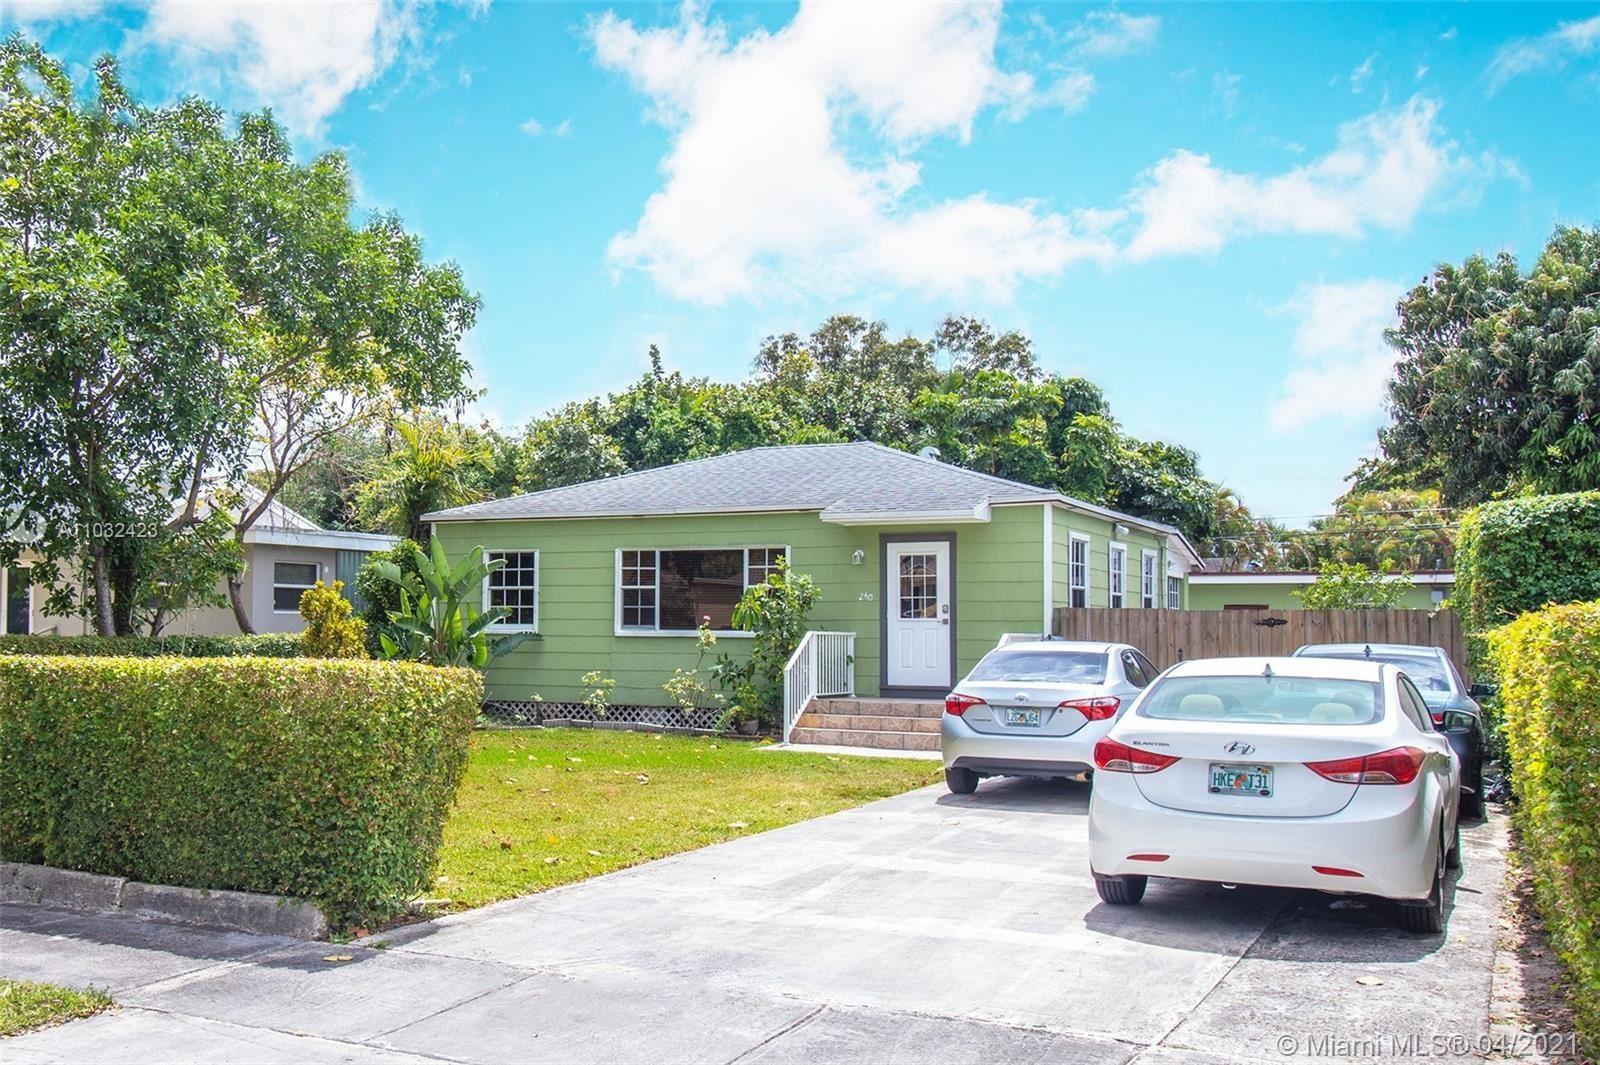 240 Carlisle Dr, Miami Springs, FL 33166 - #: A11032423